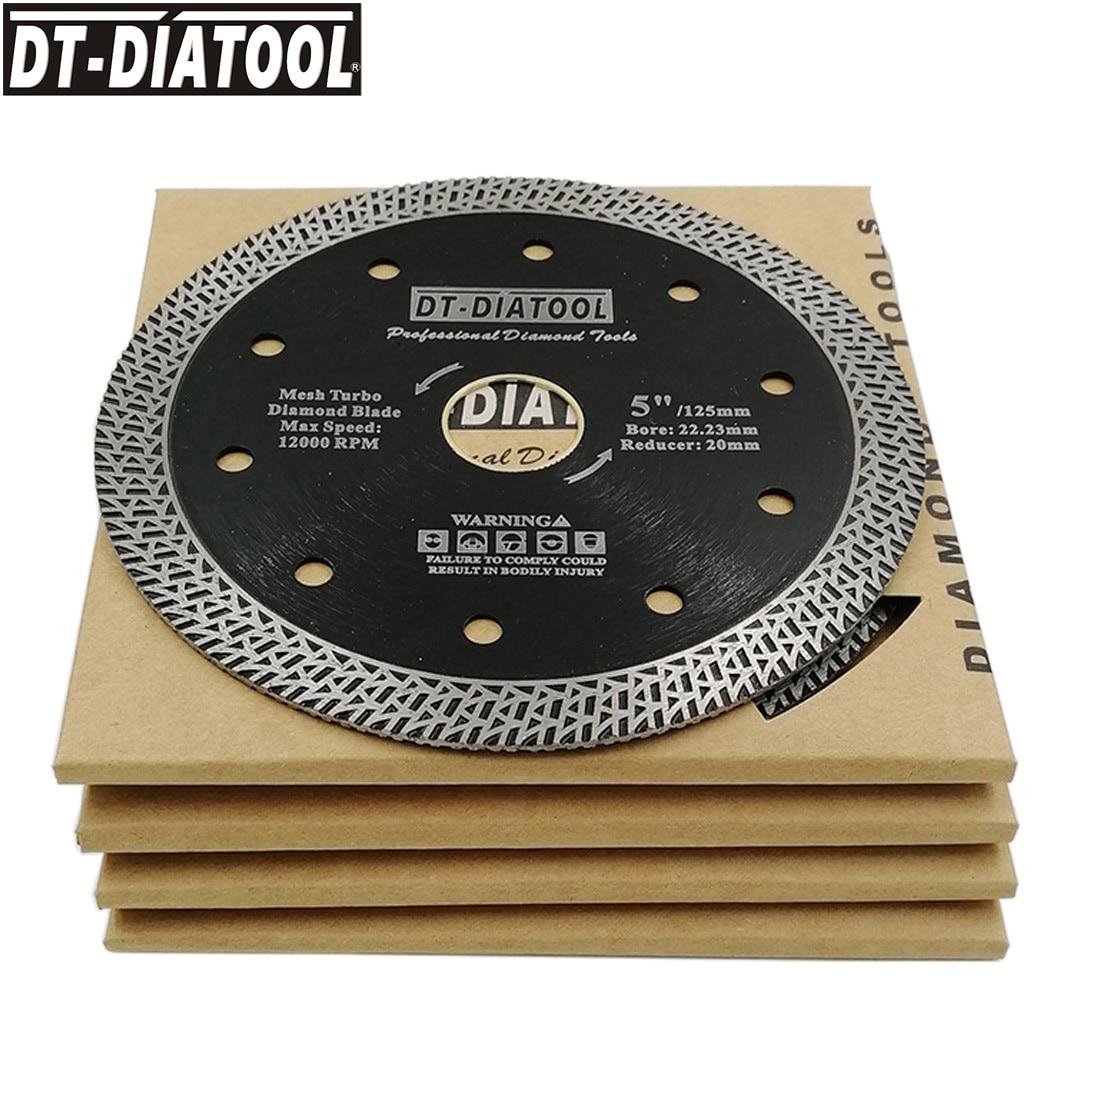 DT-DIATOOL 5pcs/set Mesh Turbo Diamond  Cutting Disc Saw Blade Wheel for Granite Marble Tile Brick Dia 4/4.5/5